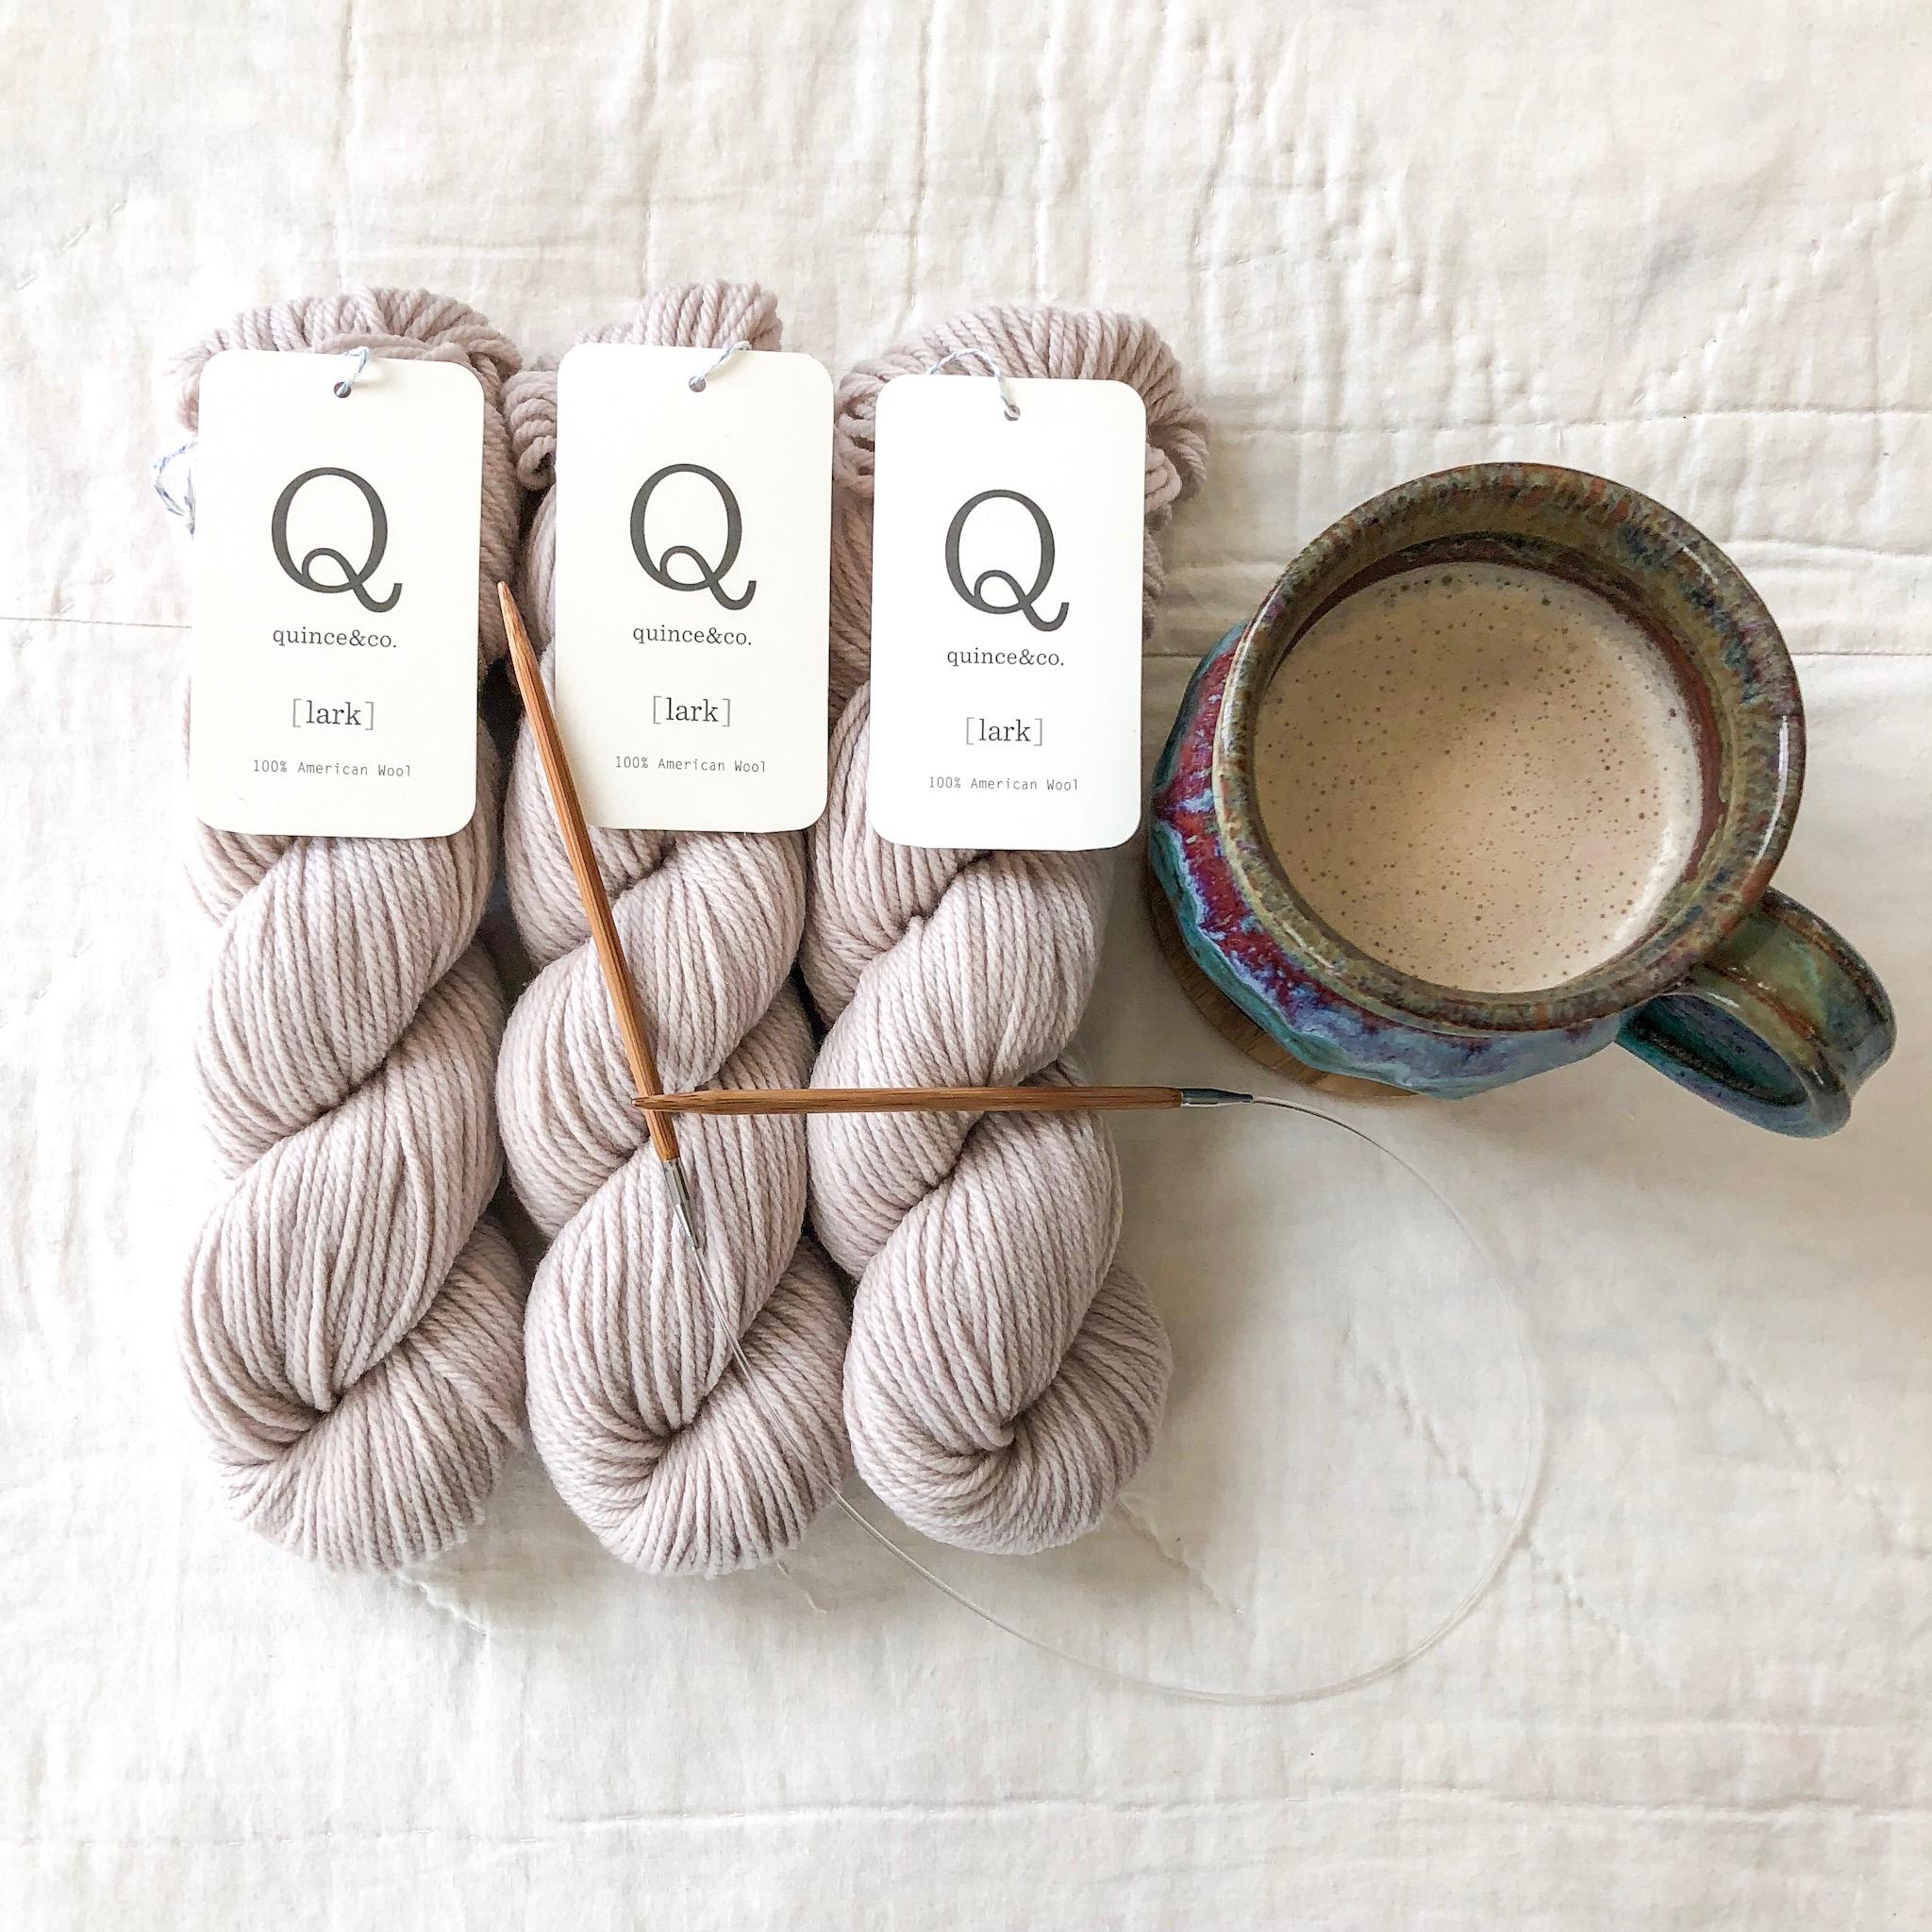 Quince & Co. Lark